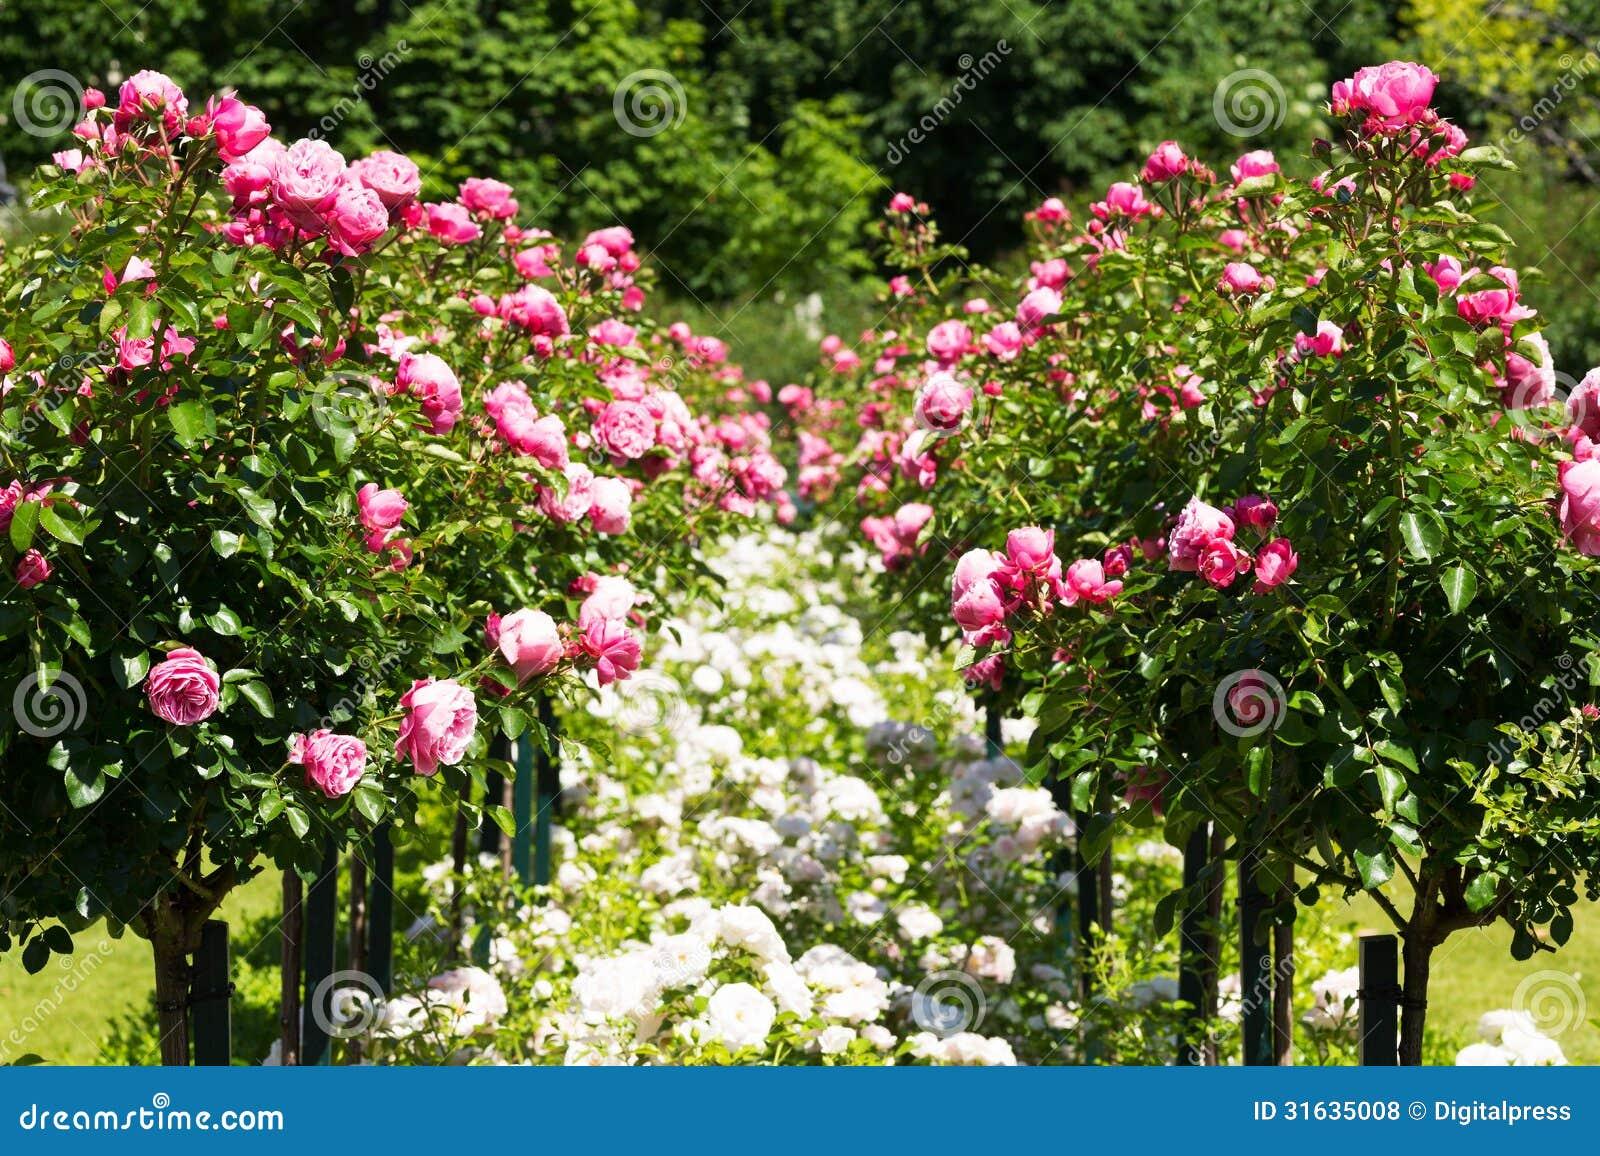 Garden Roses Stock Photo Image Of Horizontal Blossom